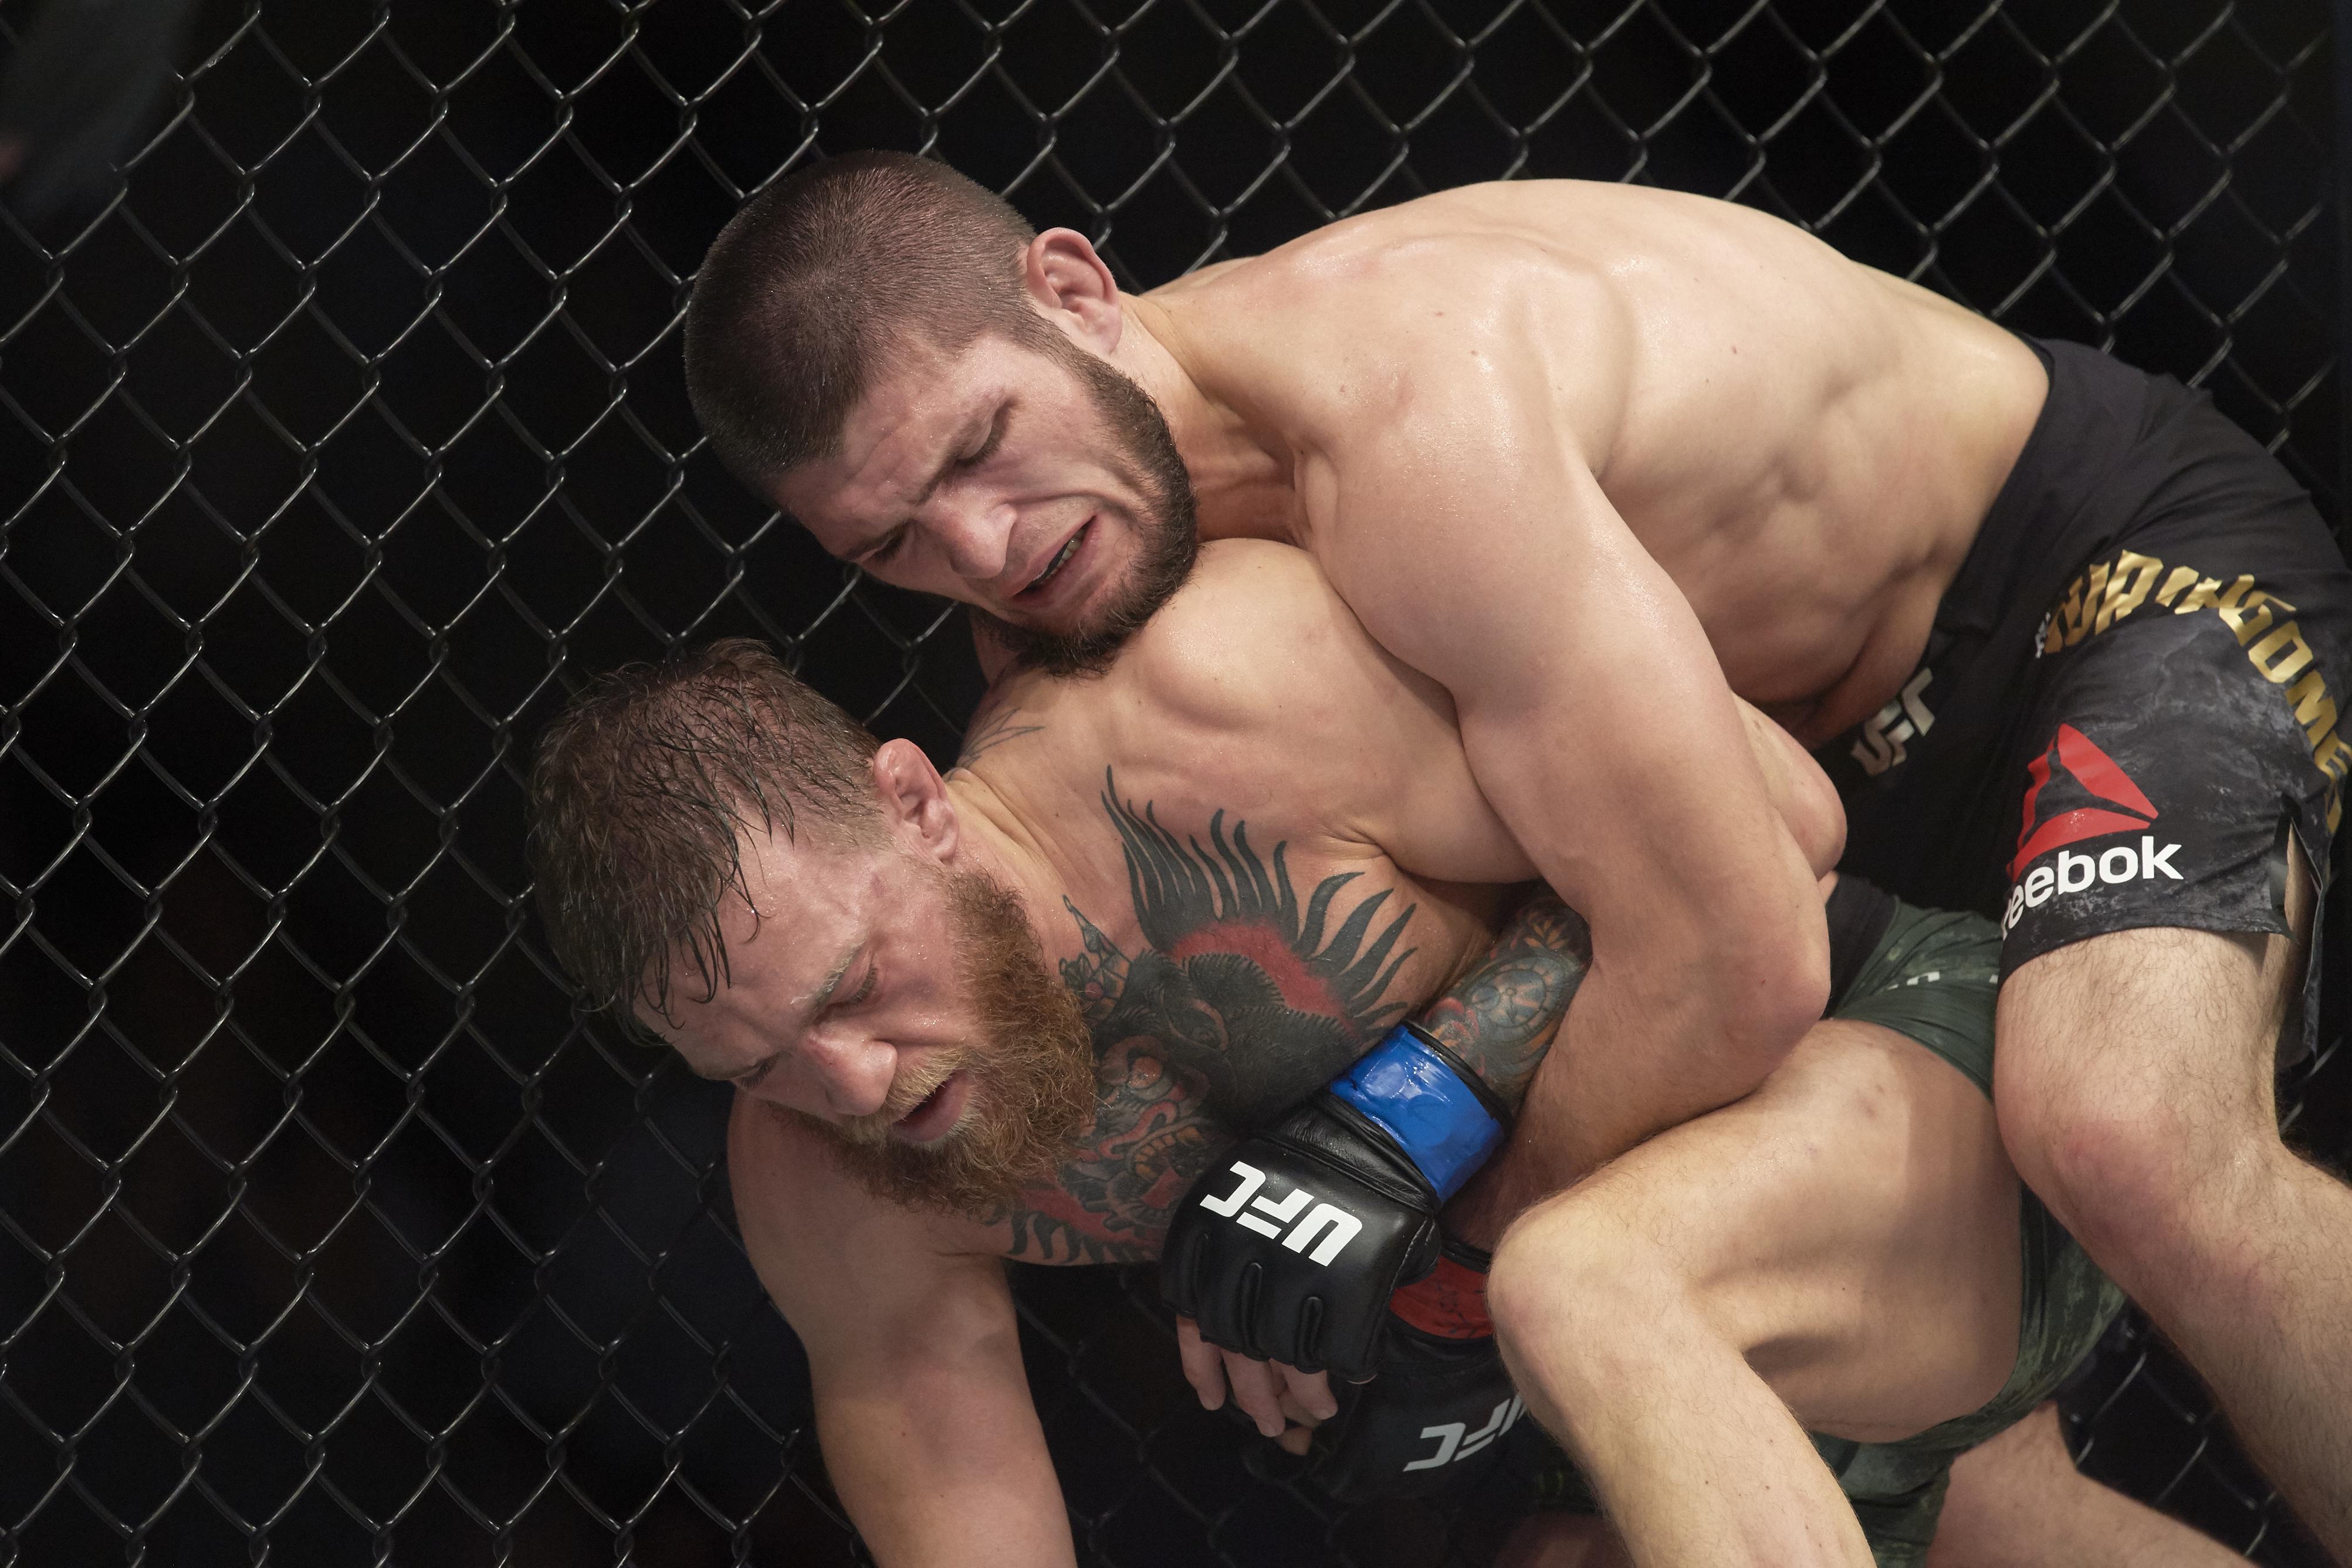 Conor McGregor vs Khabib Nurmagomedov, Ultimate Fighting Championship 229